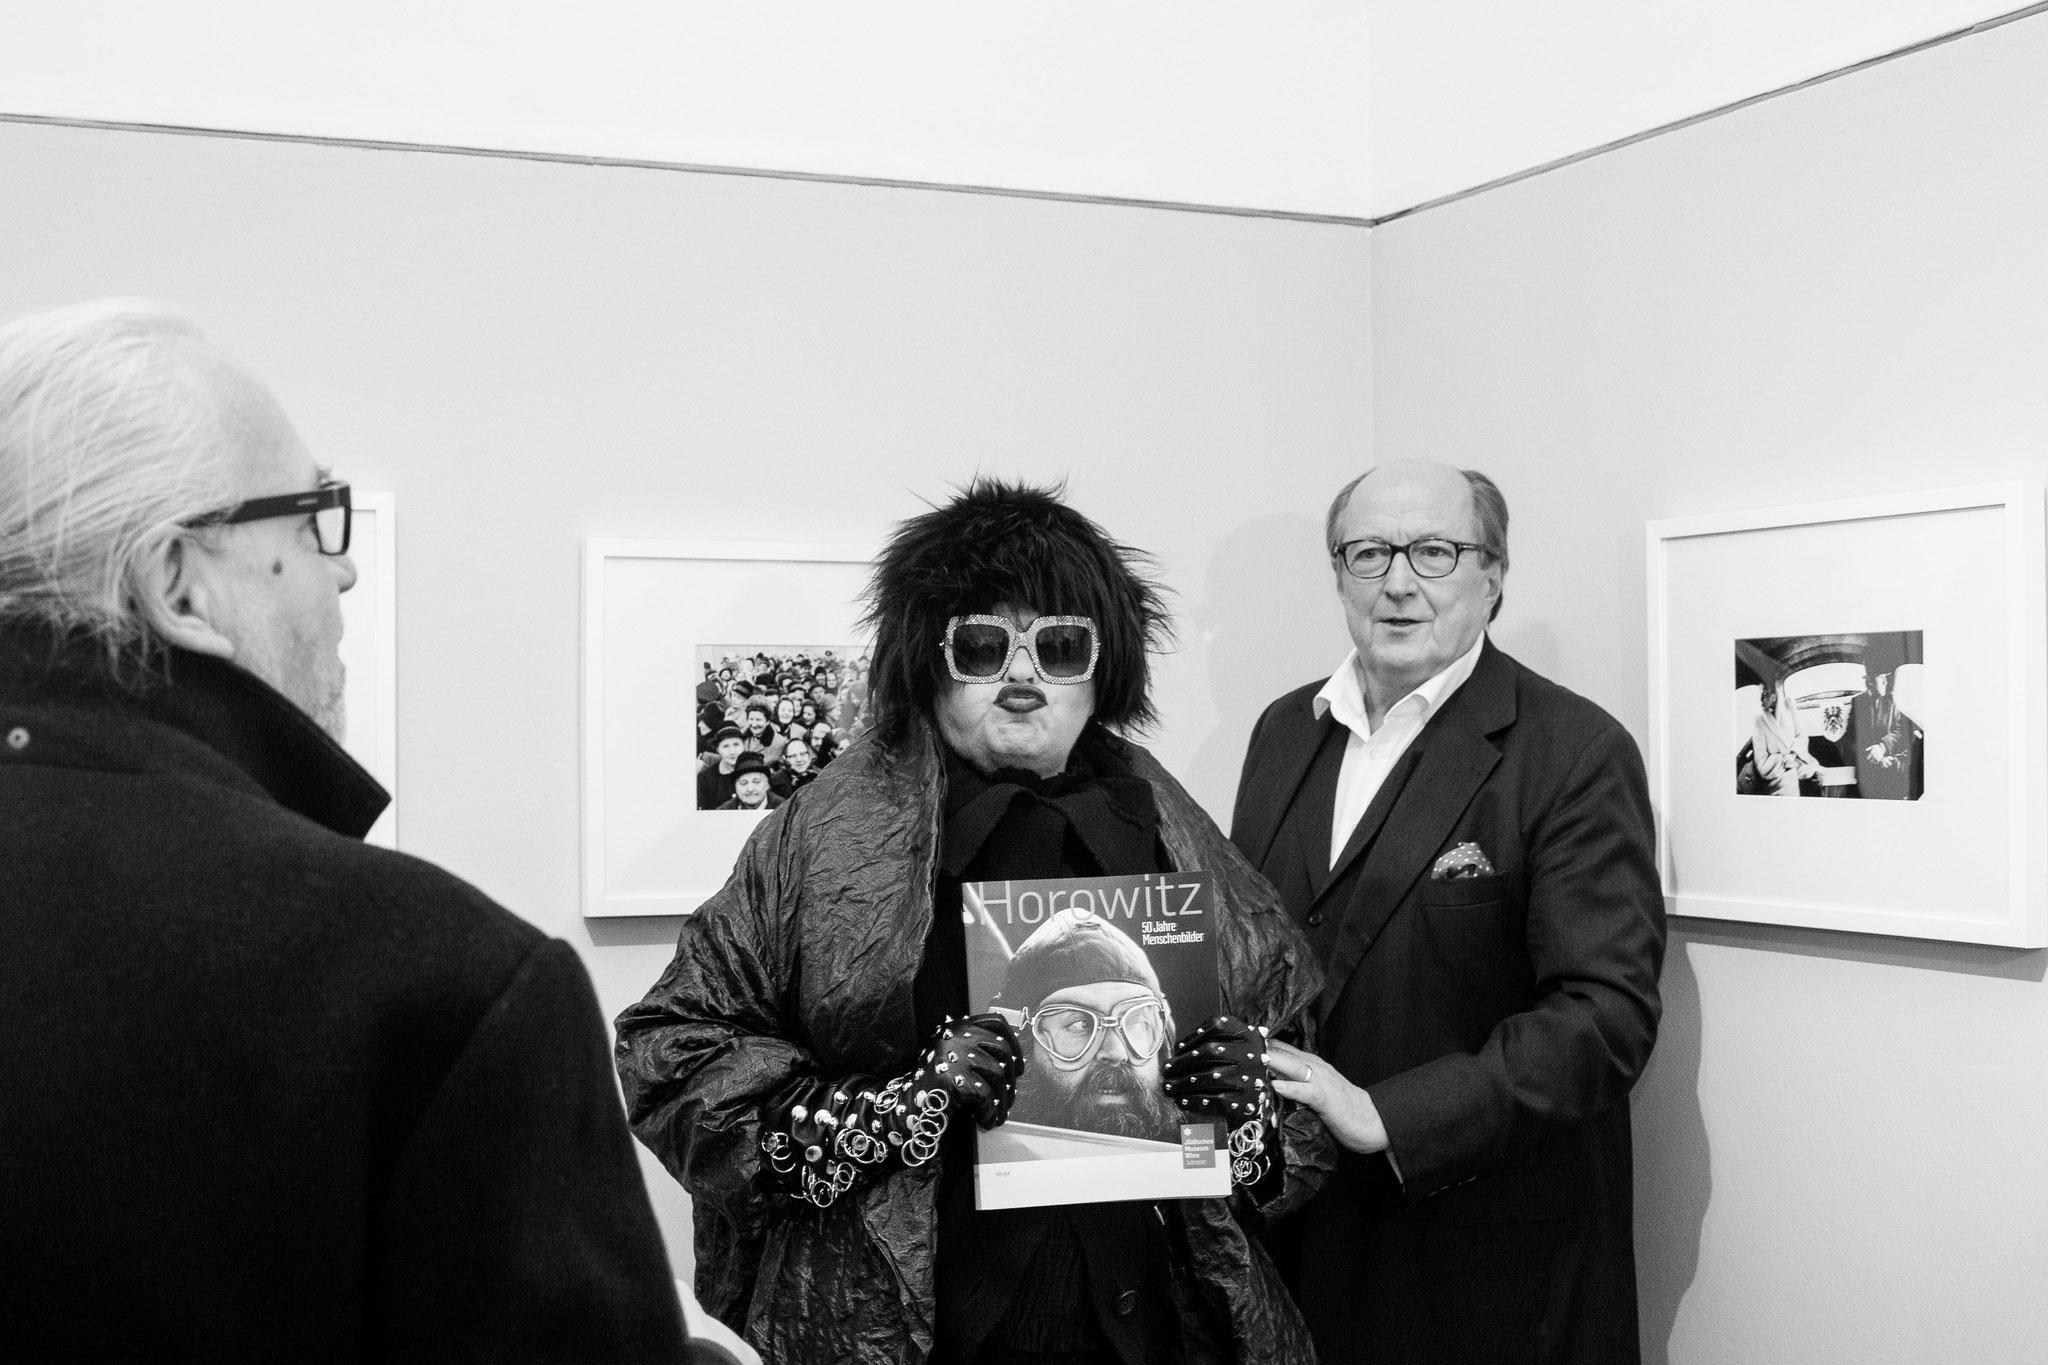 Michael Horowitz, Susanne Widl